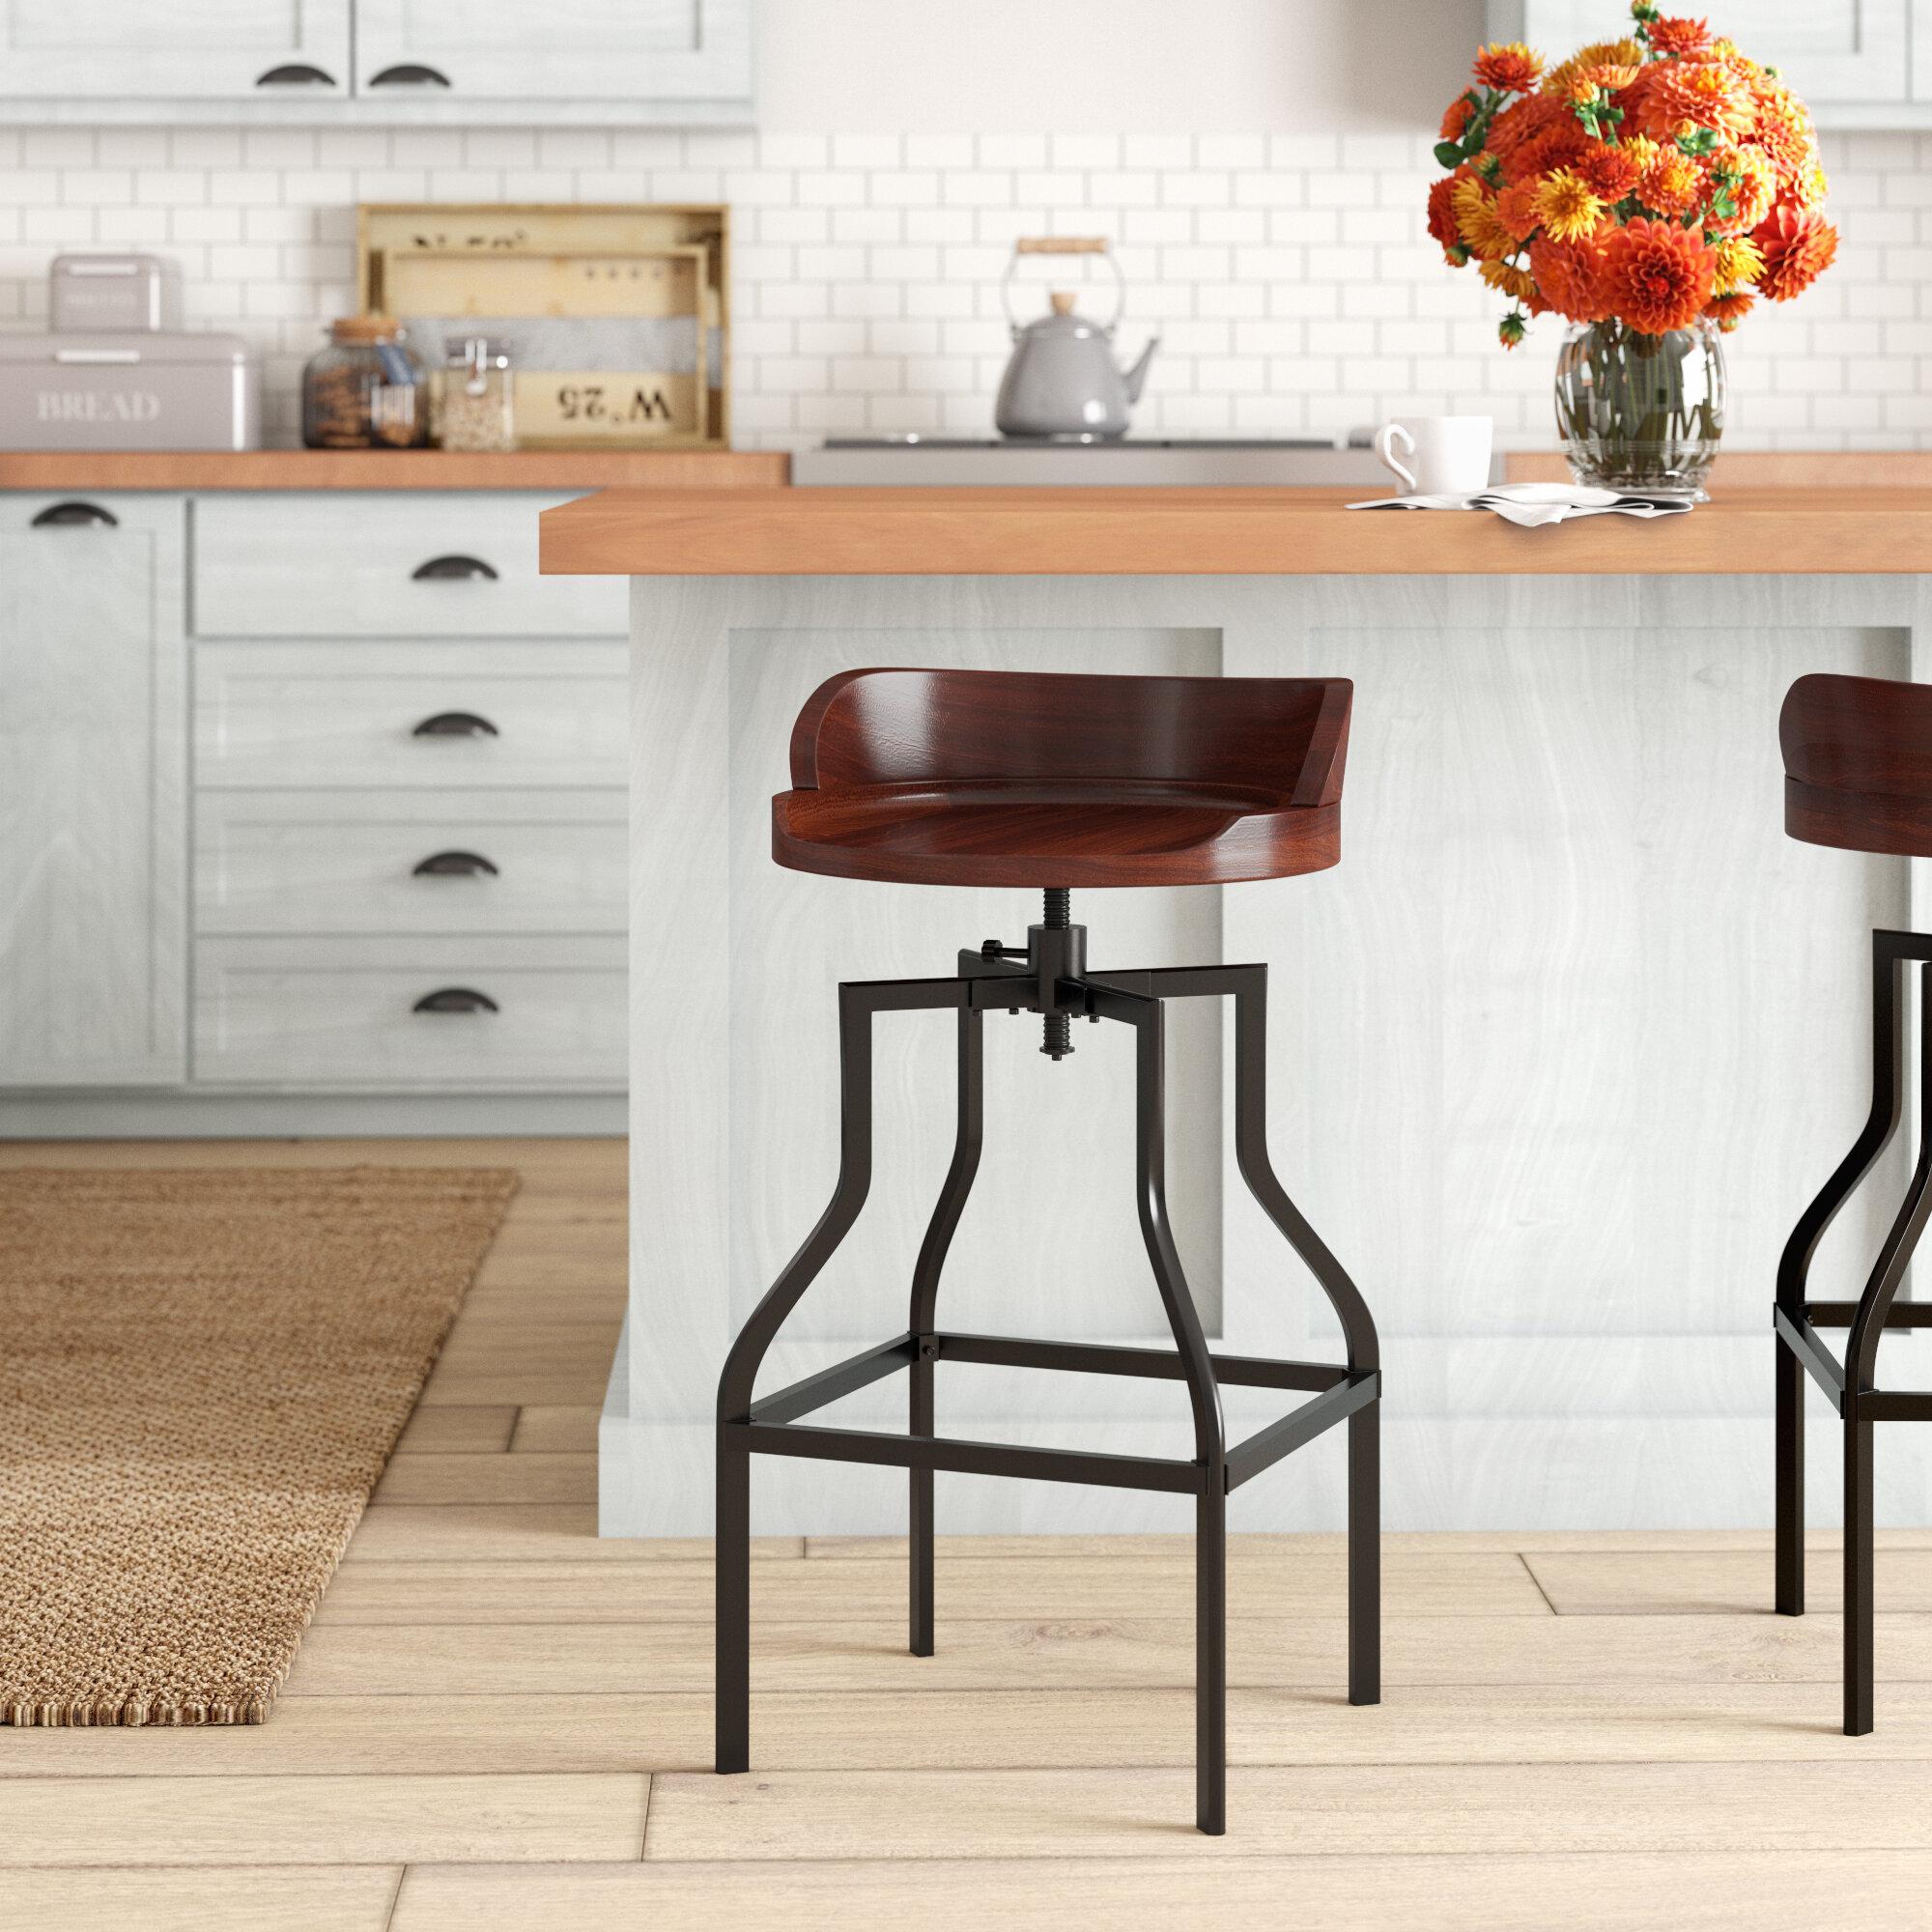 Remarkable Caddo Adjustable Height Swivel Bar Stool Beatyapartments Chair Design Images Beatyapartmentscom